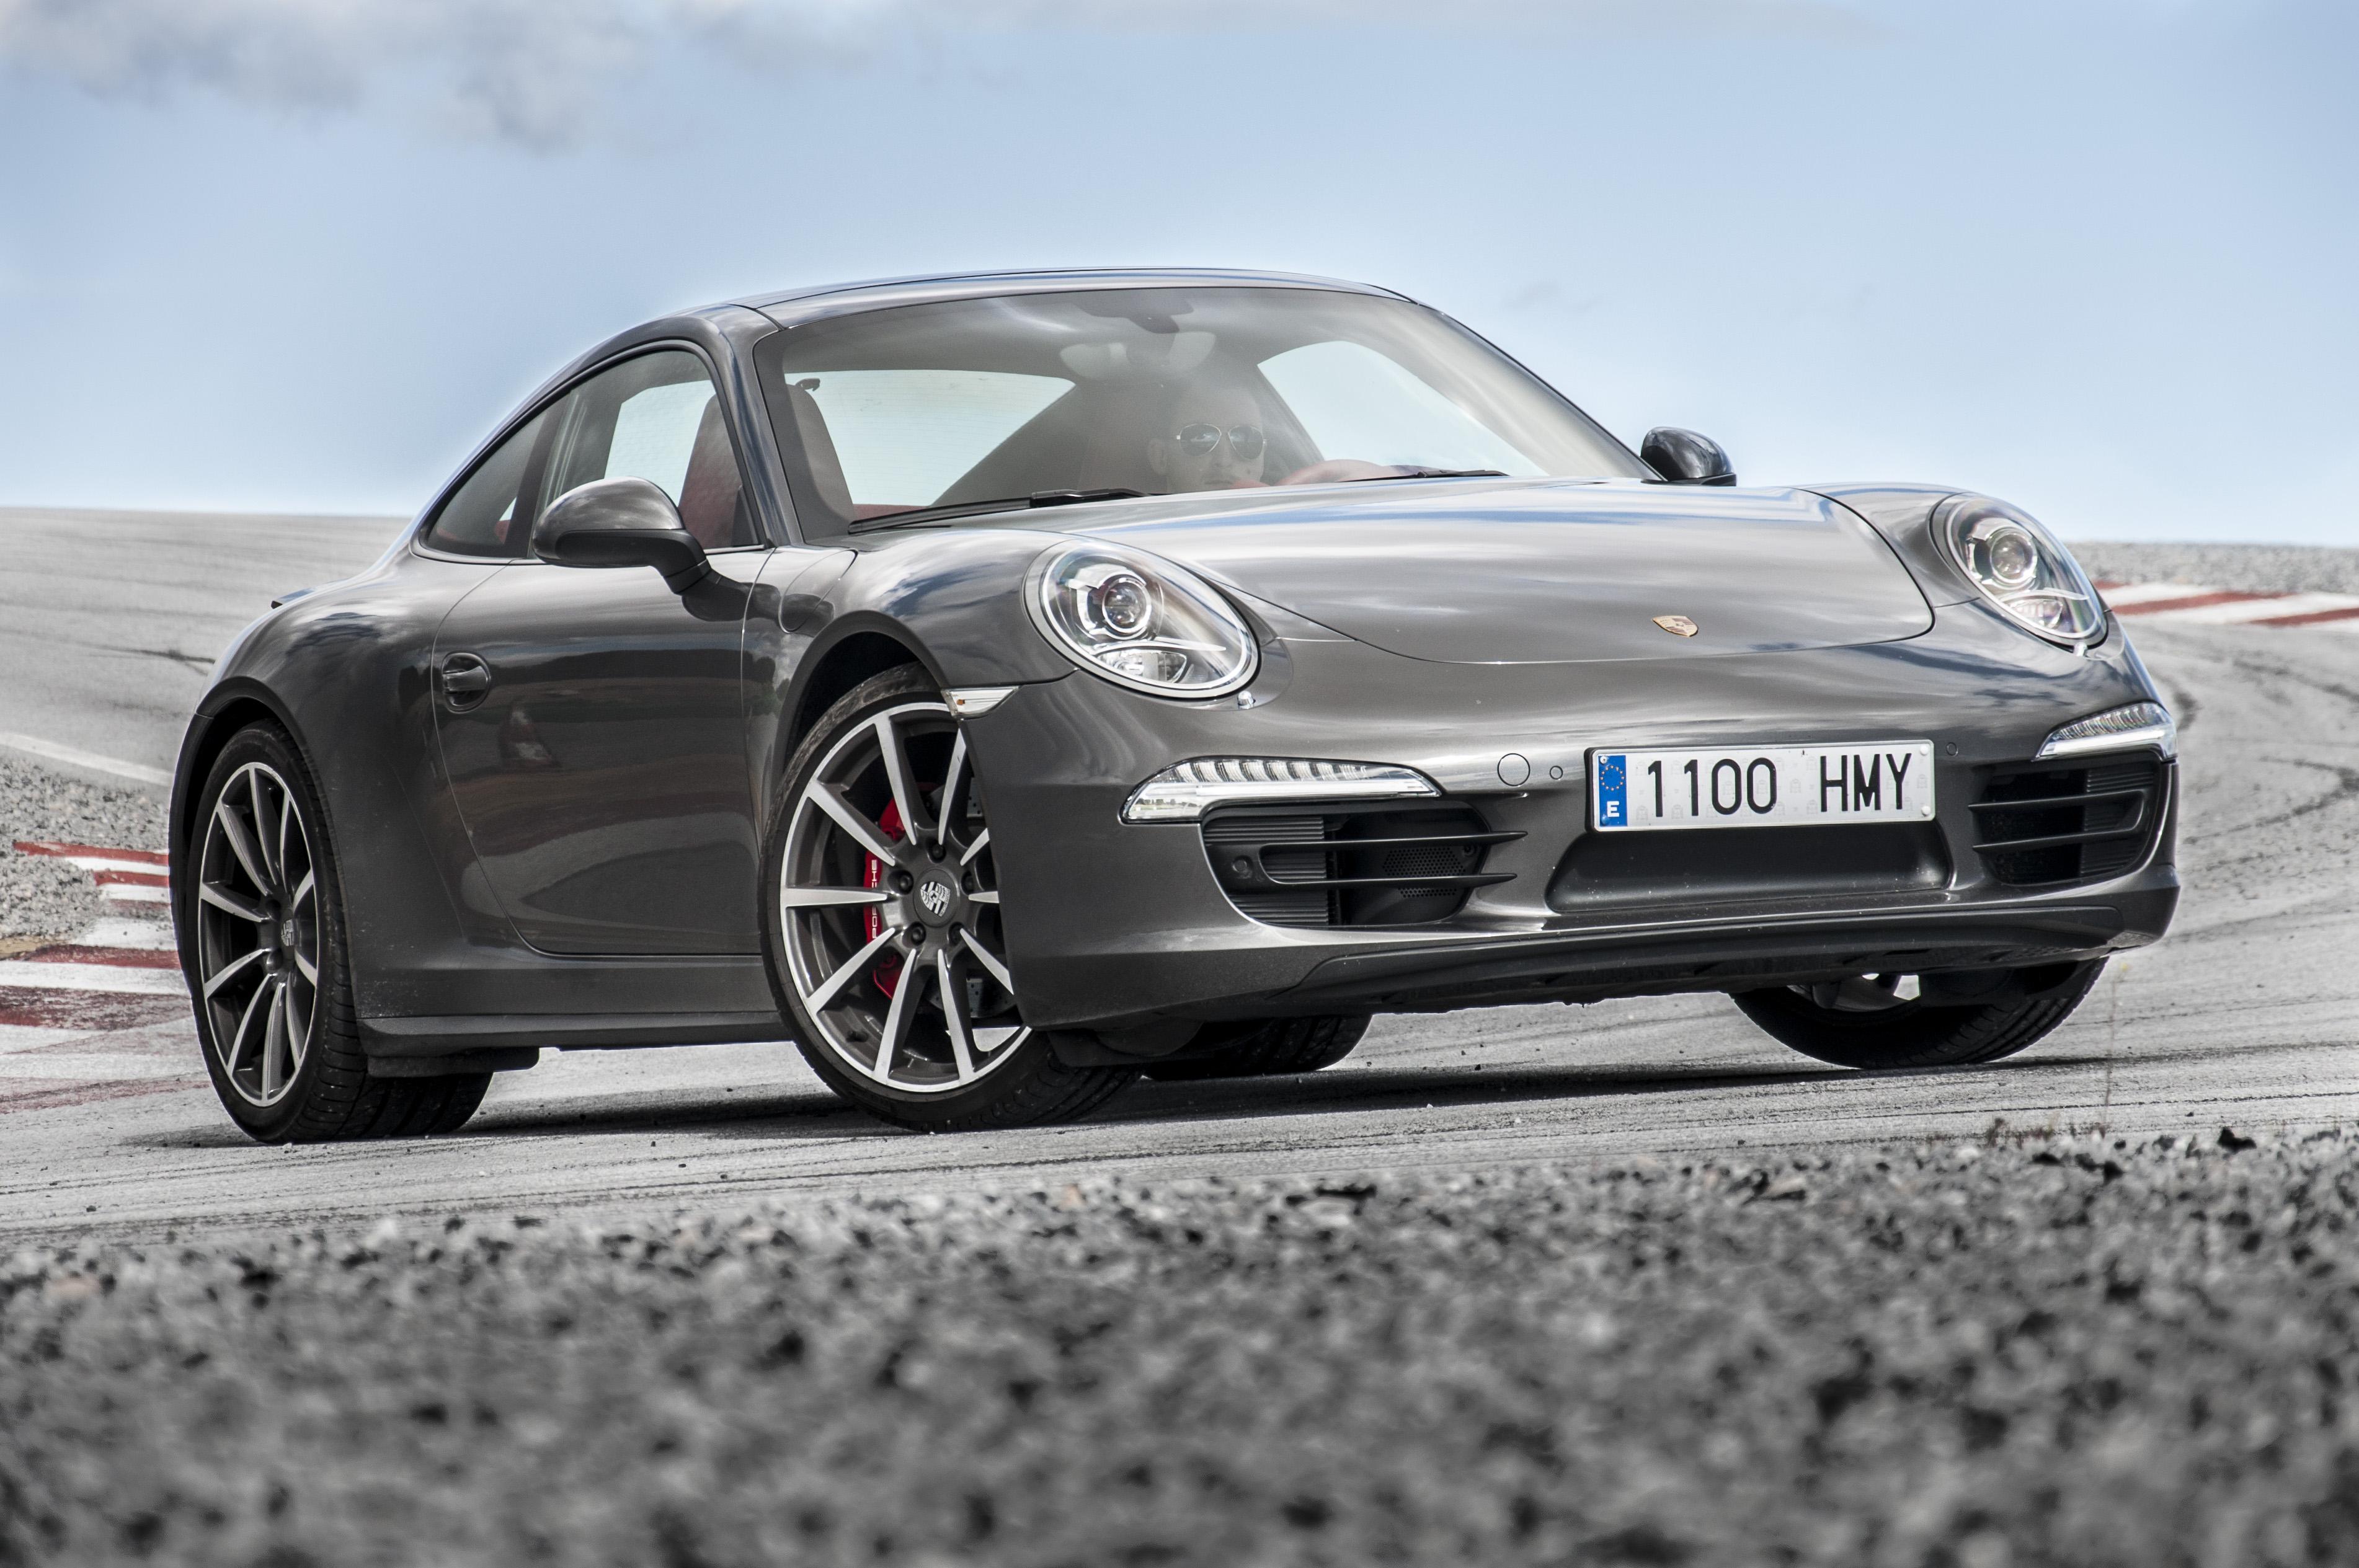 2013_Porsche_911_Carrera_4S_(991)_(9626546987)